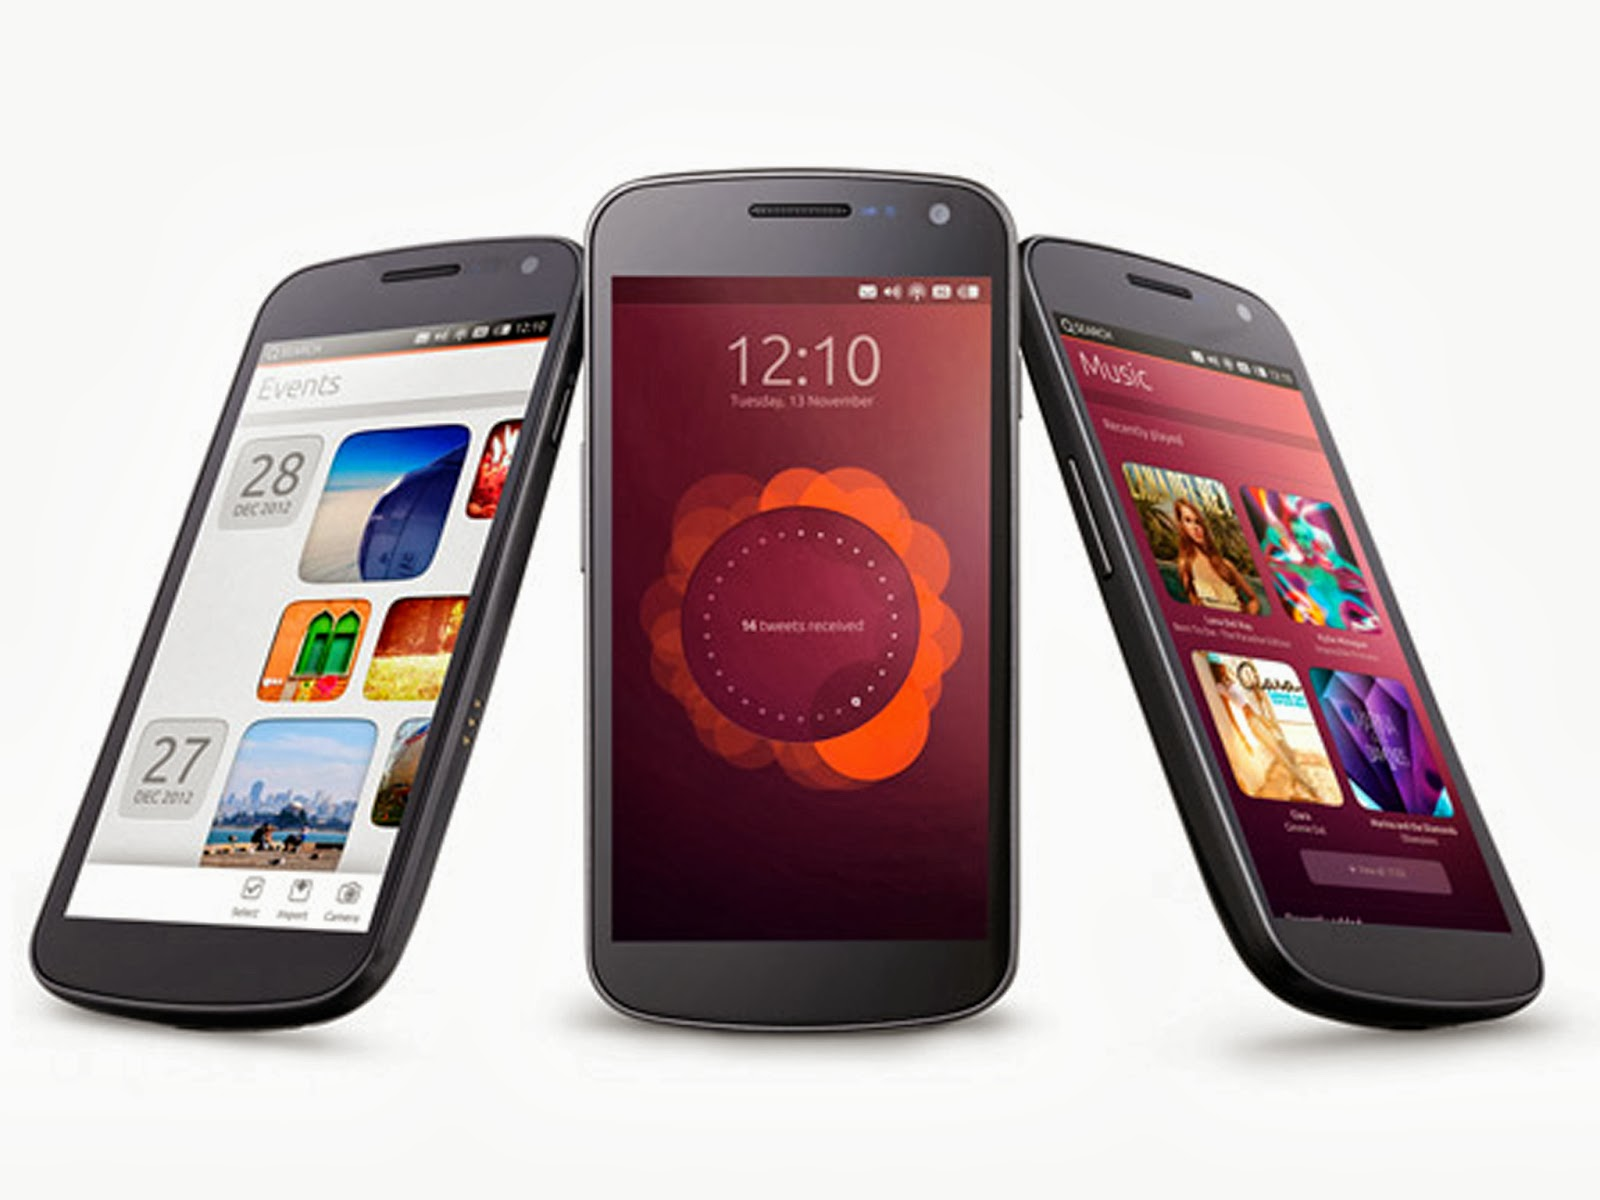 Phone Upcoming Android Phones Verizon upcoming phones hands on futuristic verizon phones